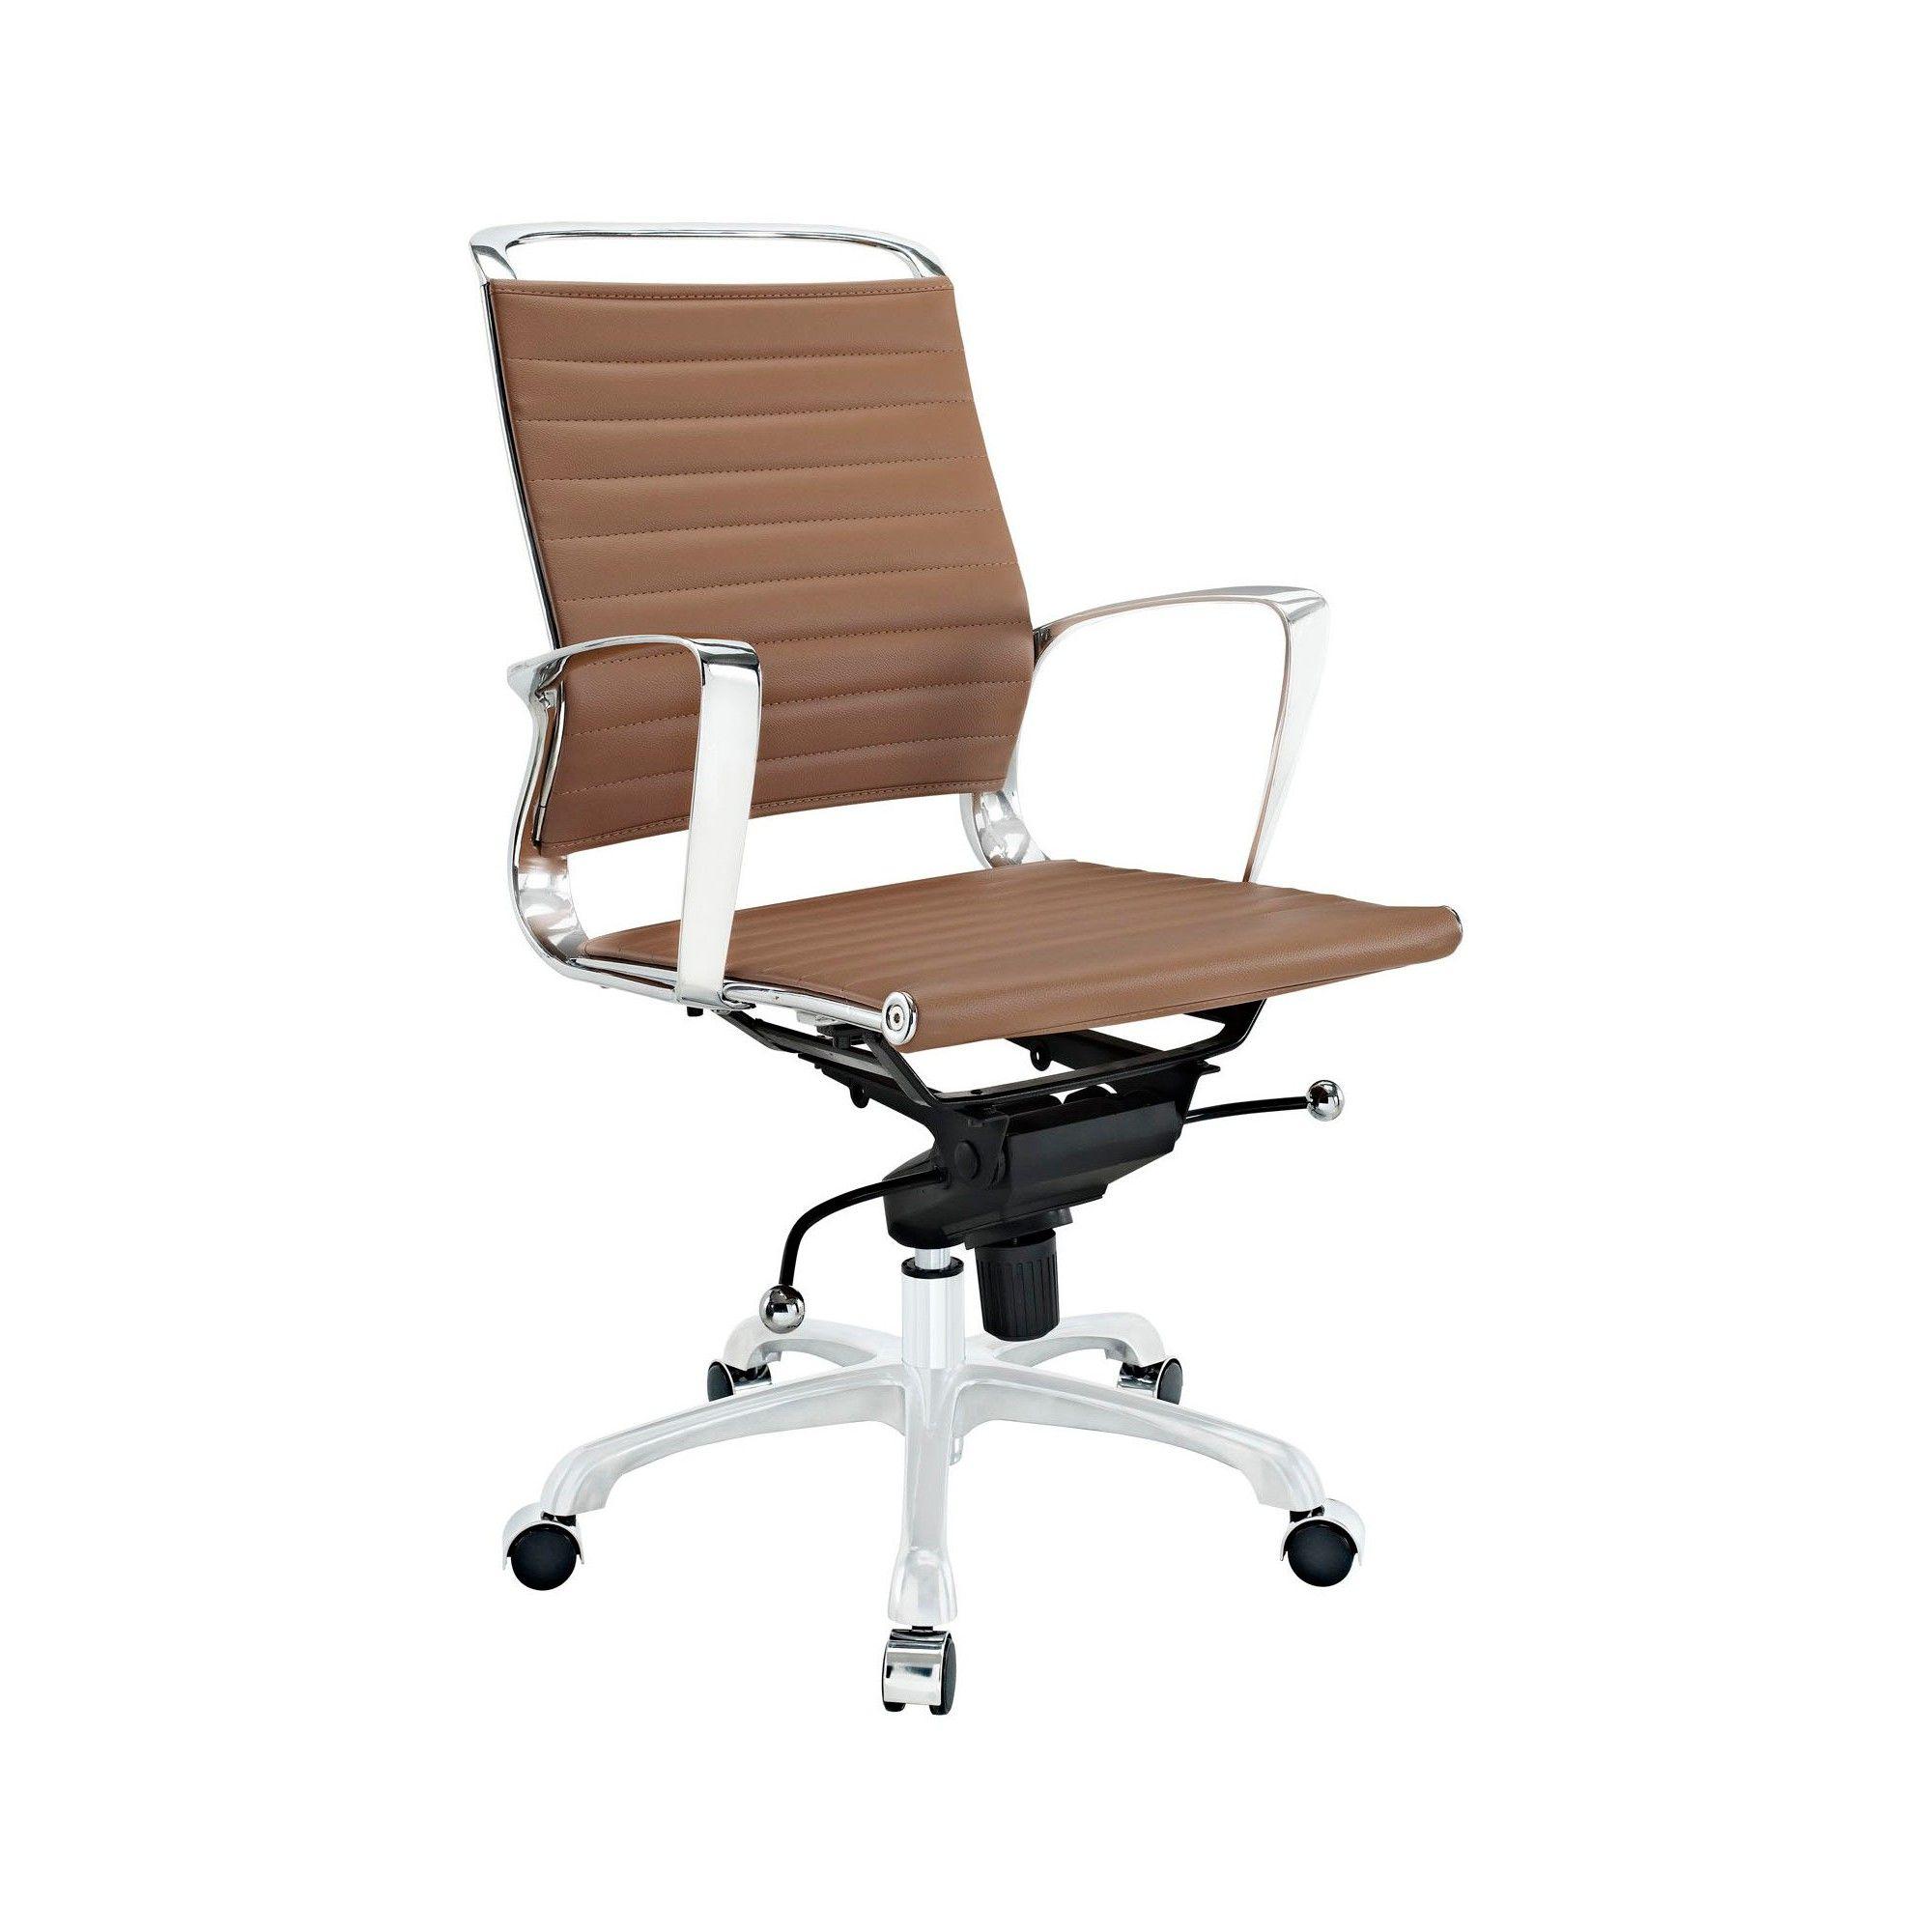 office chair modway basic tan products pinterest chair desk rh pinterest co uk